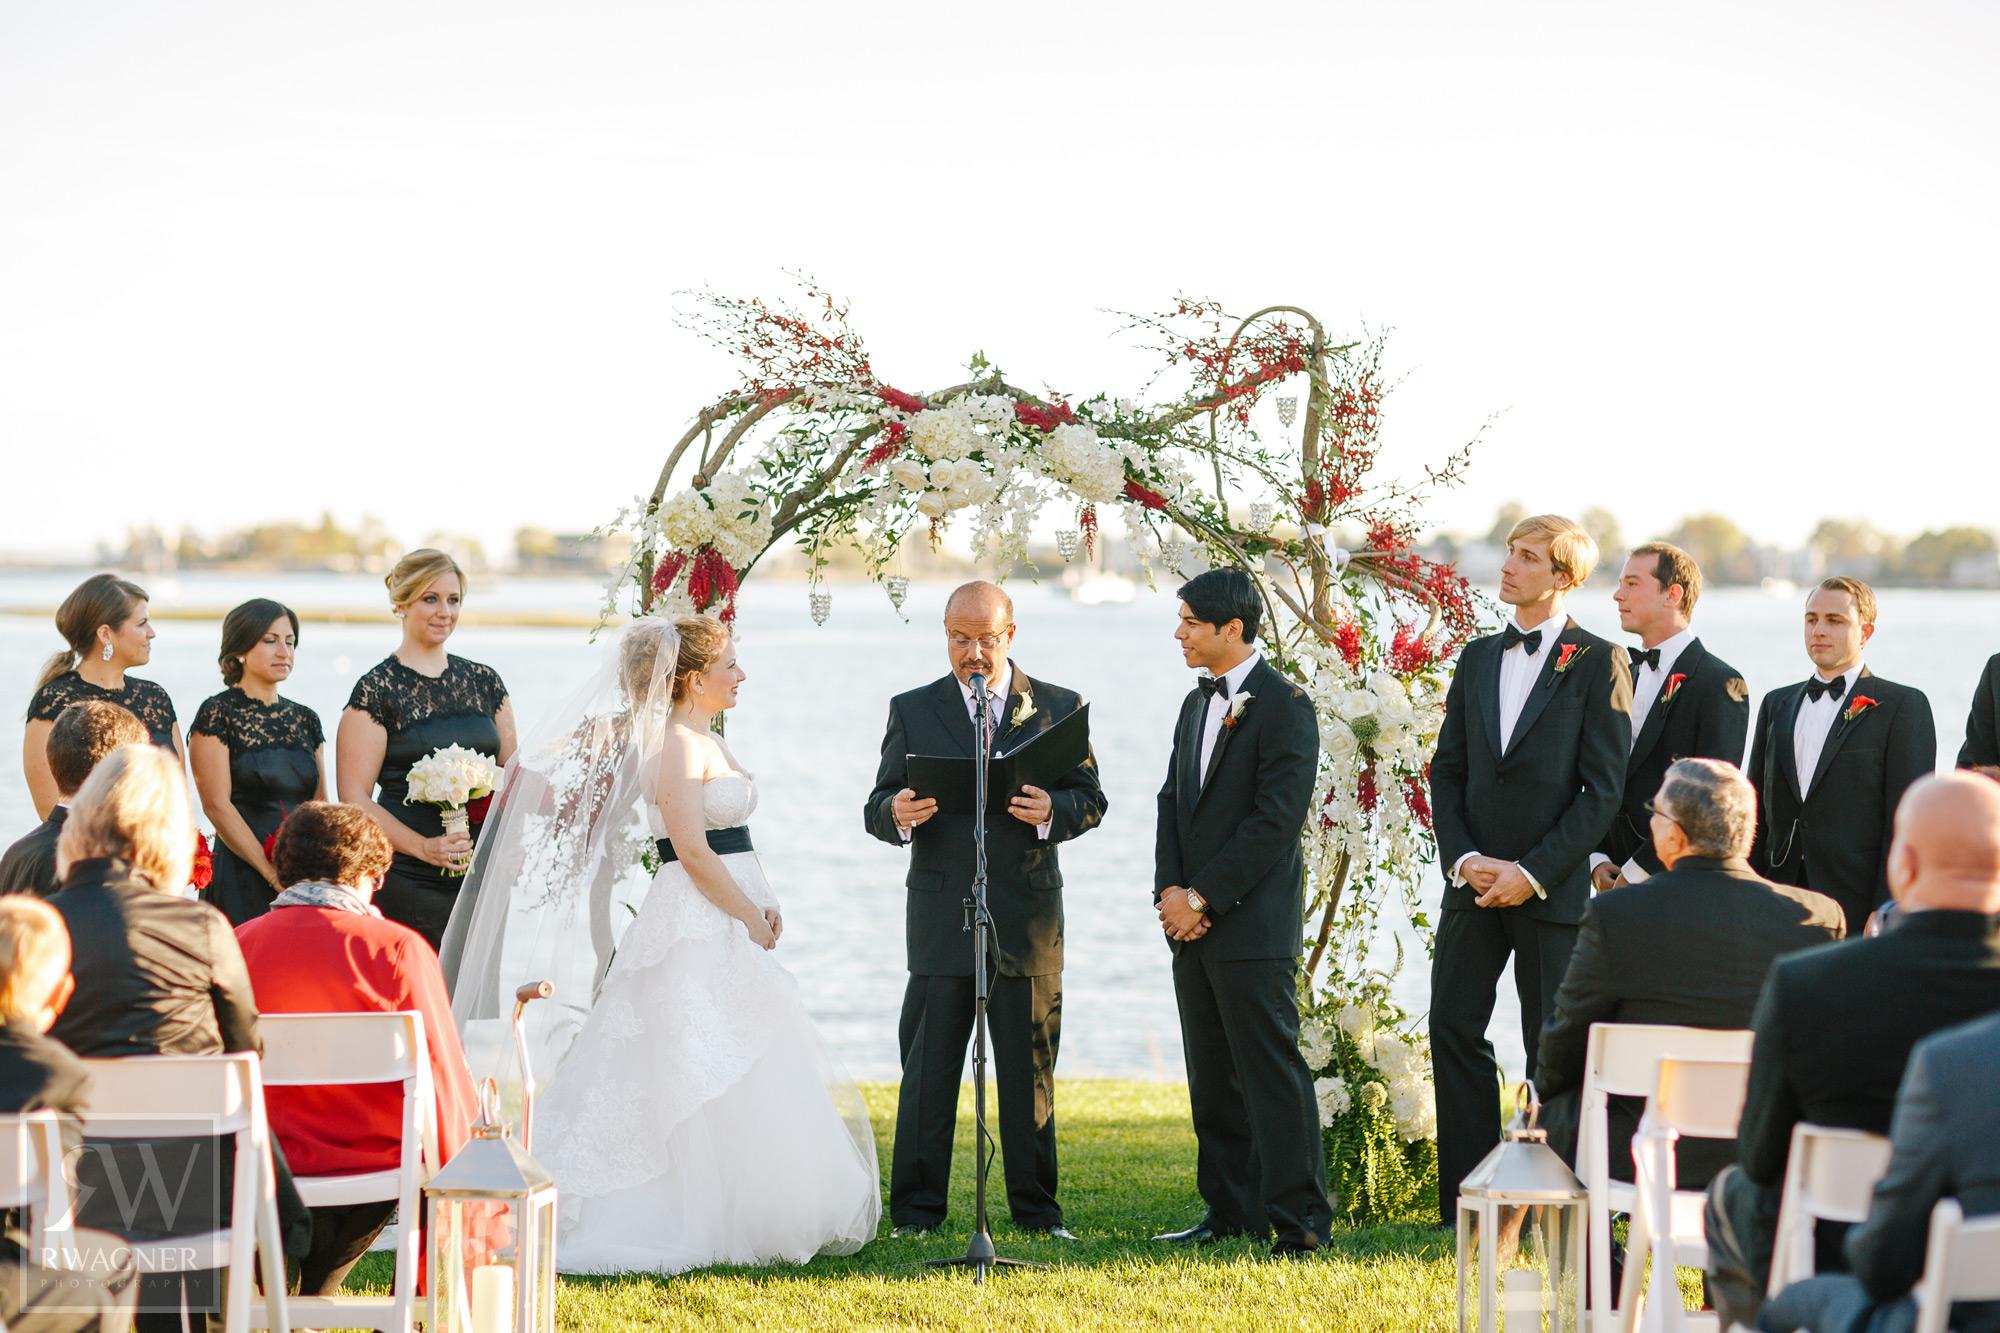 ceci_new_york_luxury_wedding_invitations_couture_red_black_white_real_wedding_dramatic_inn_at_longshore_v286_24.jpg